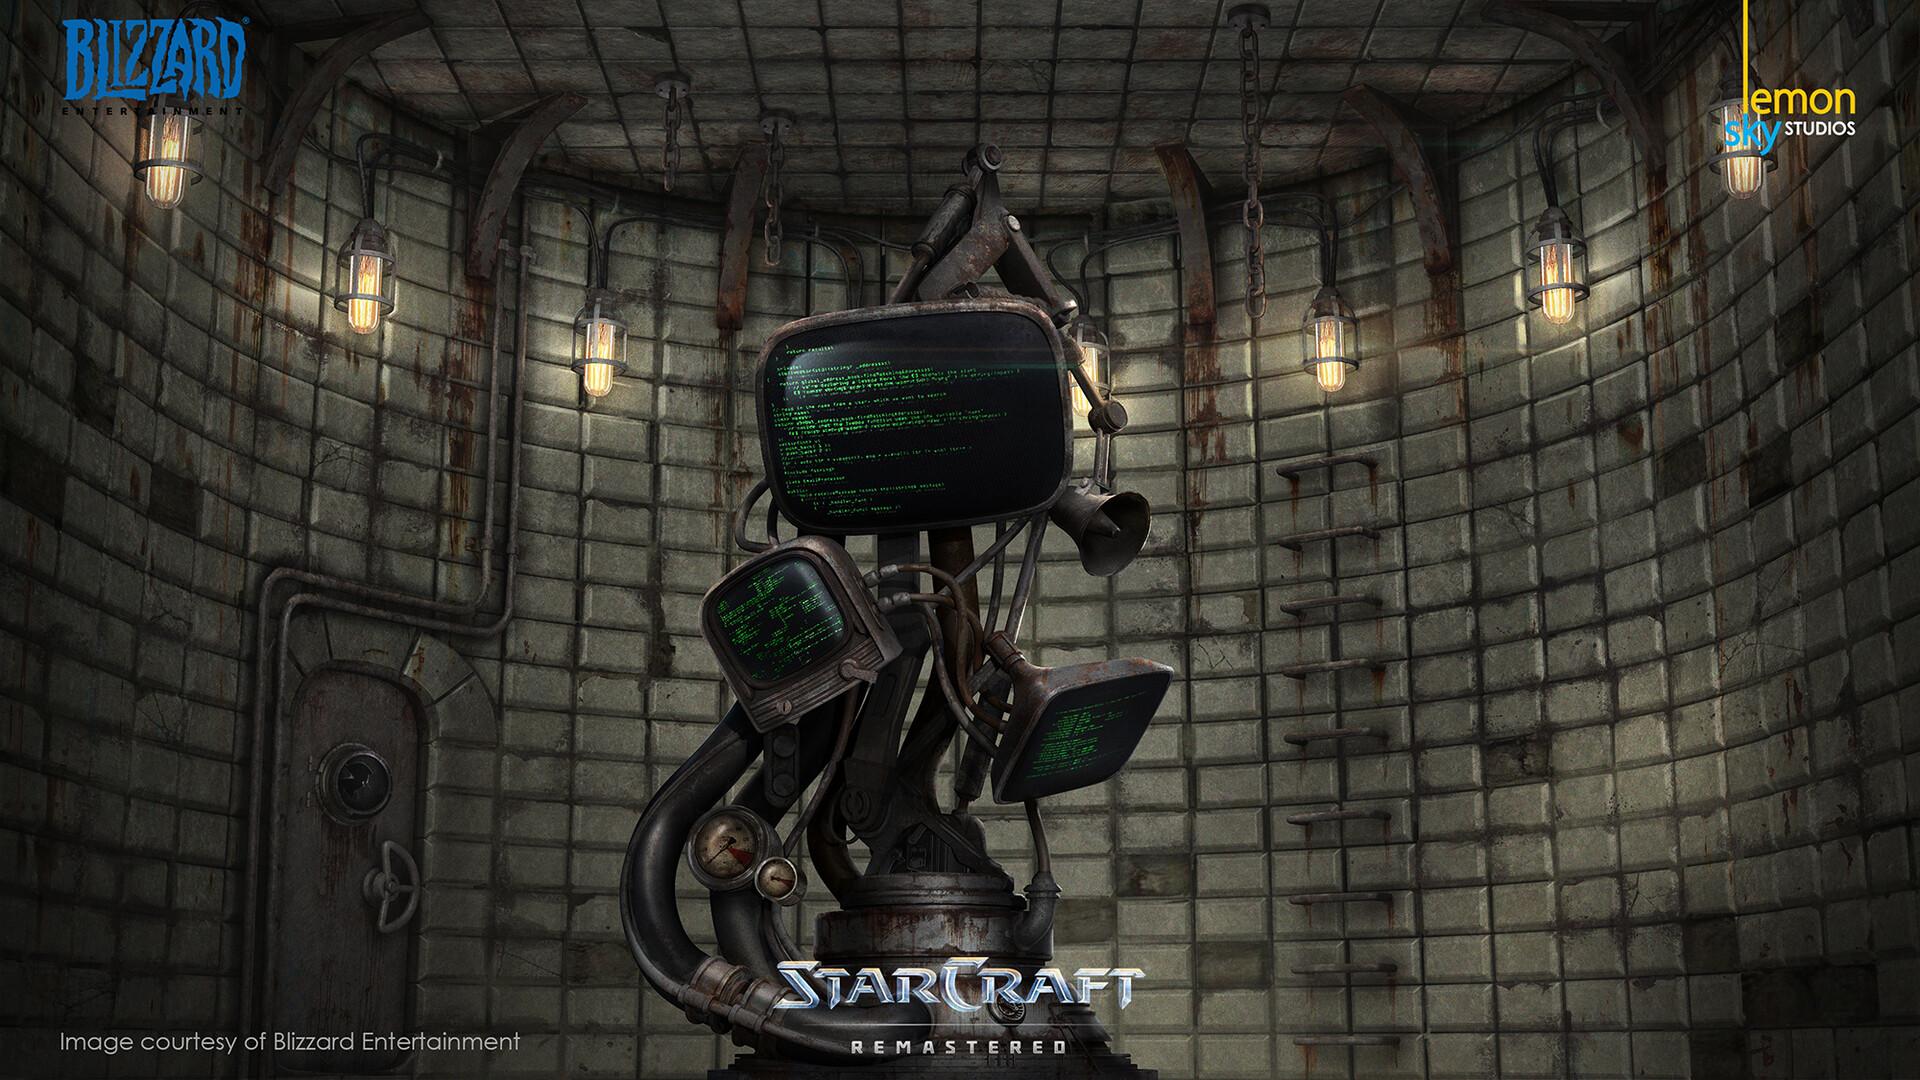 ArtStation - STARCRAFT REMASTERED, Lemon Sky Studios